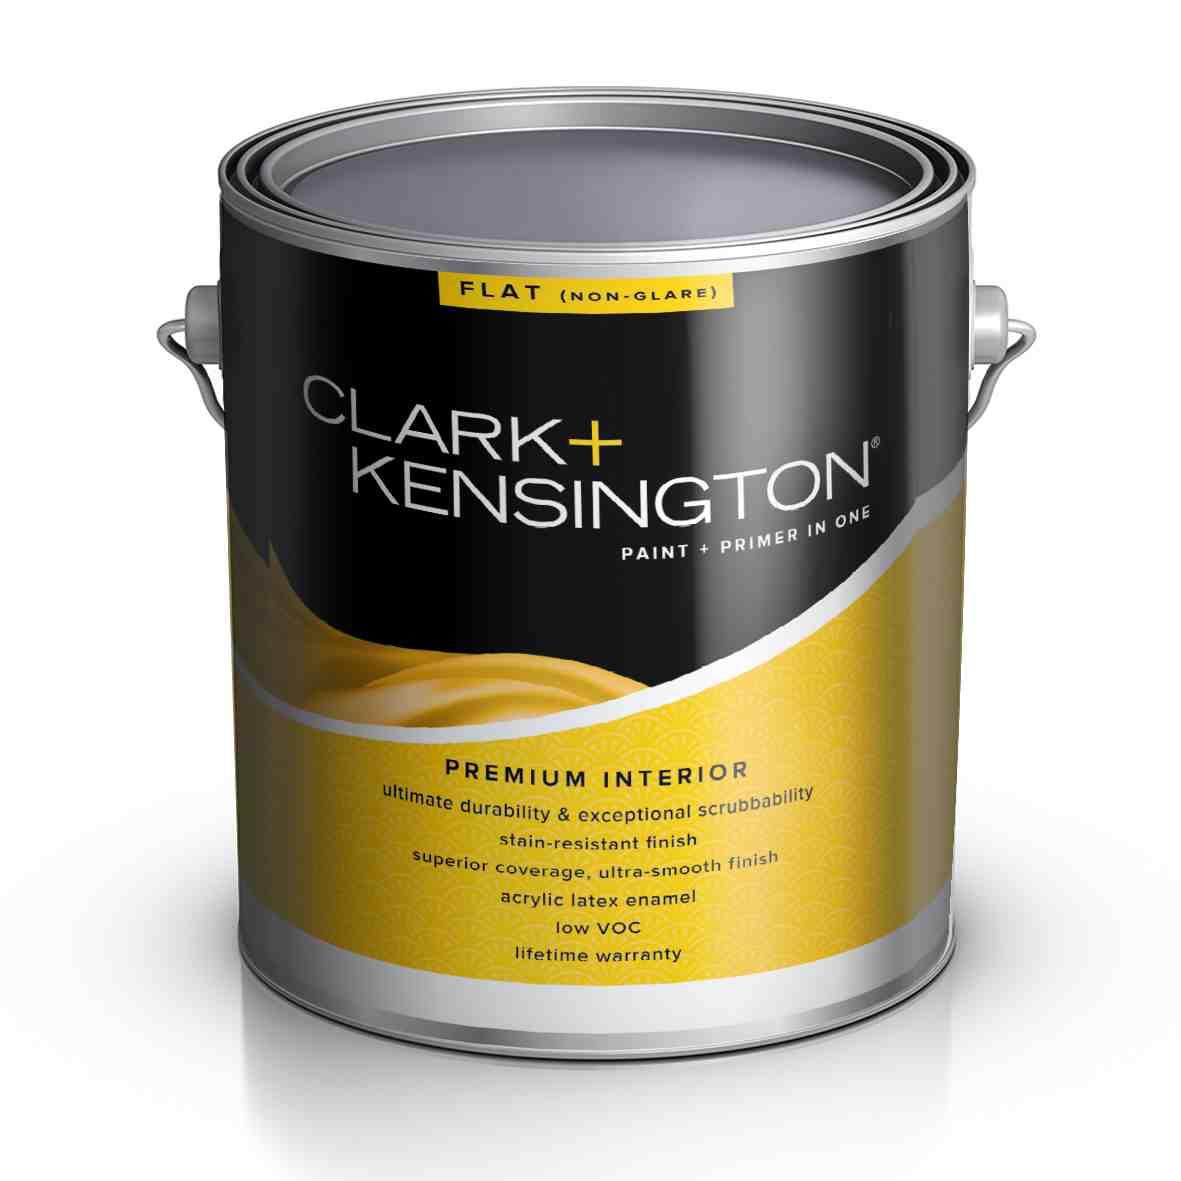 Глубоко матовая краска Clark Kensington Non-Glare (без бликов)